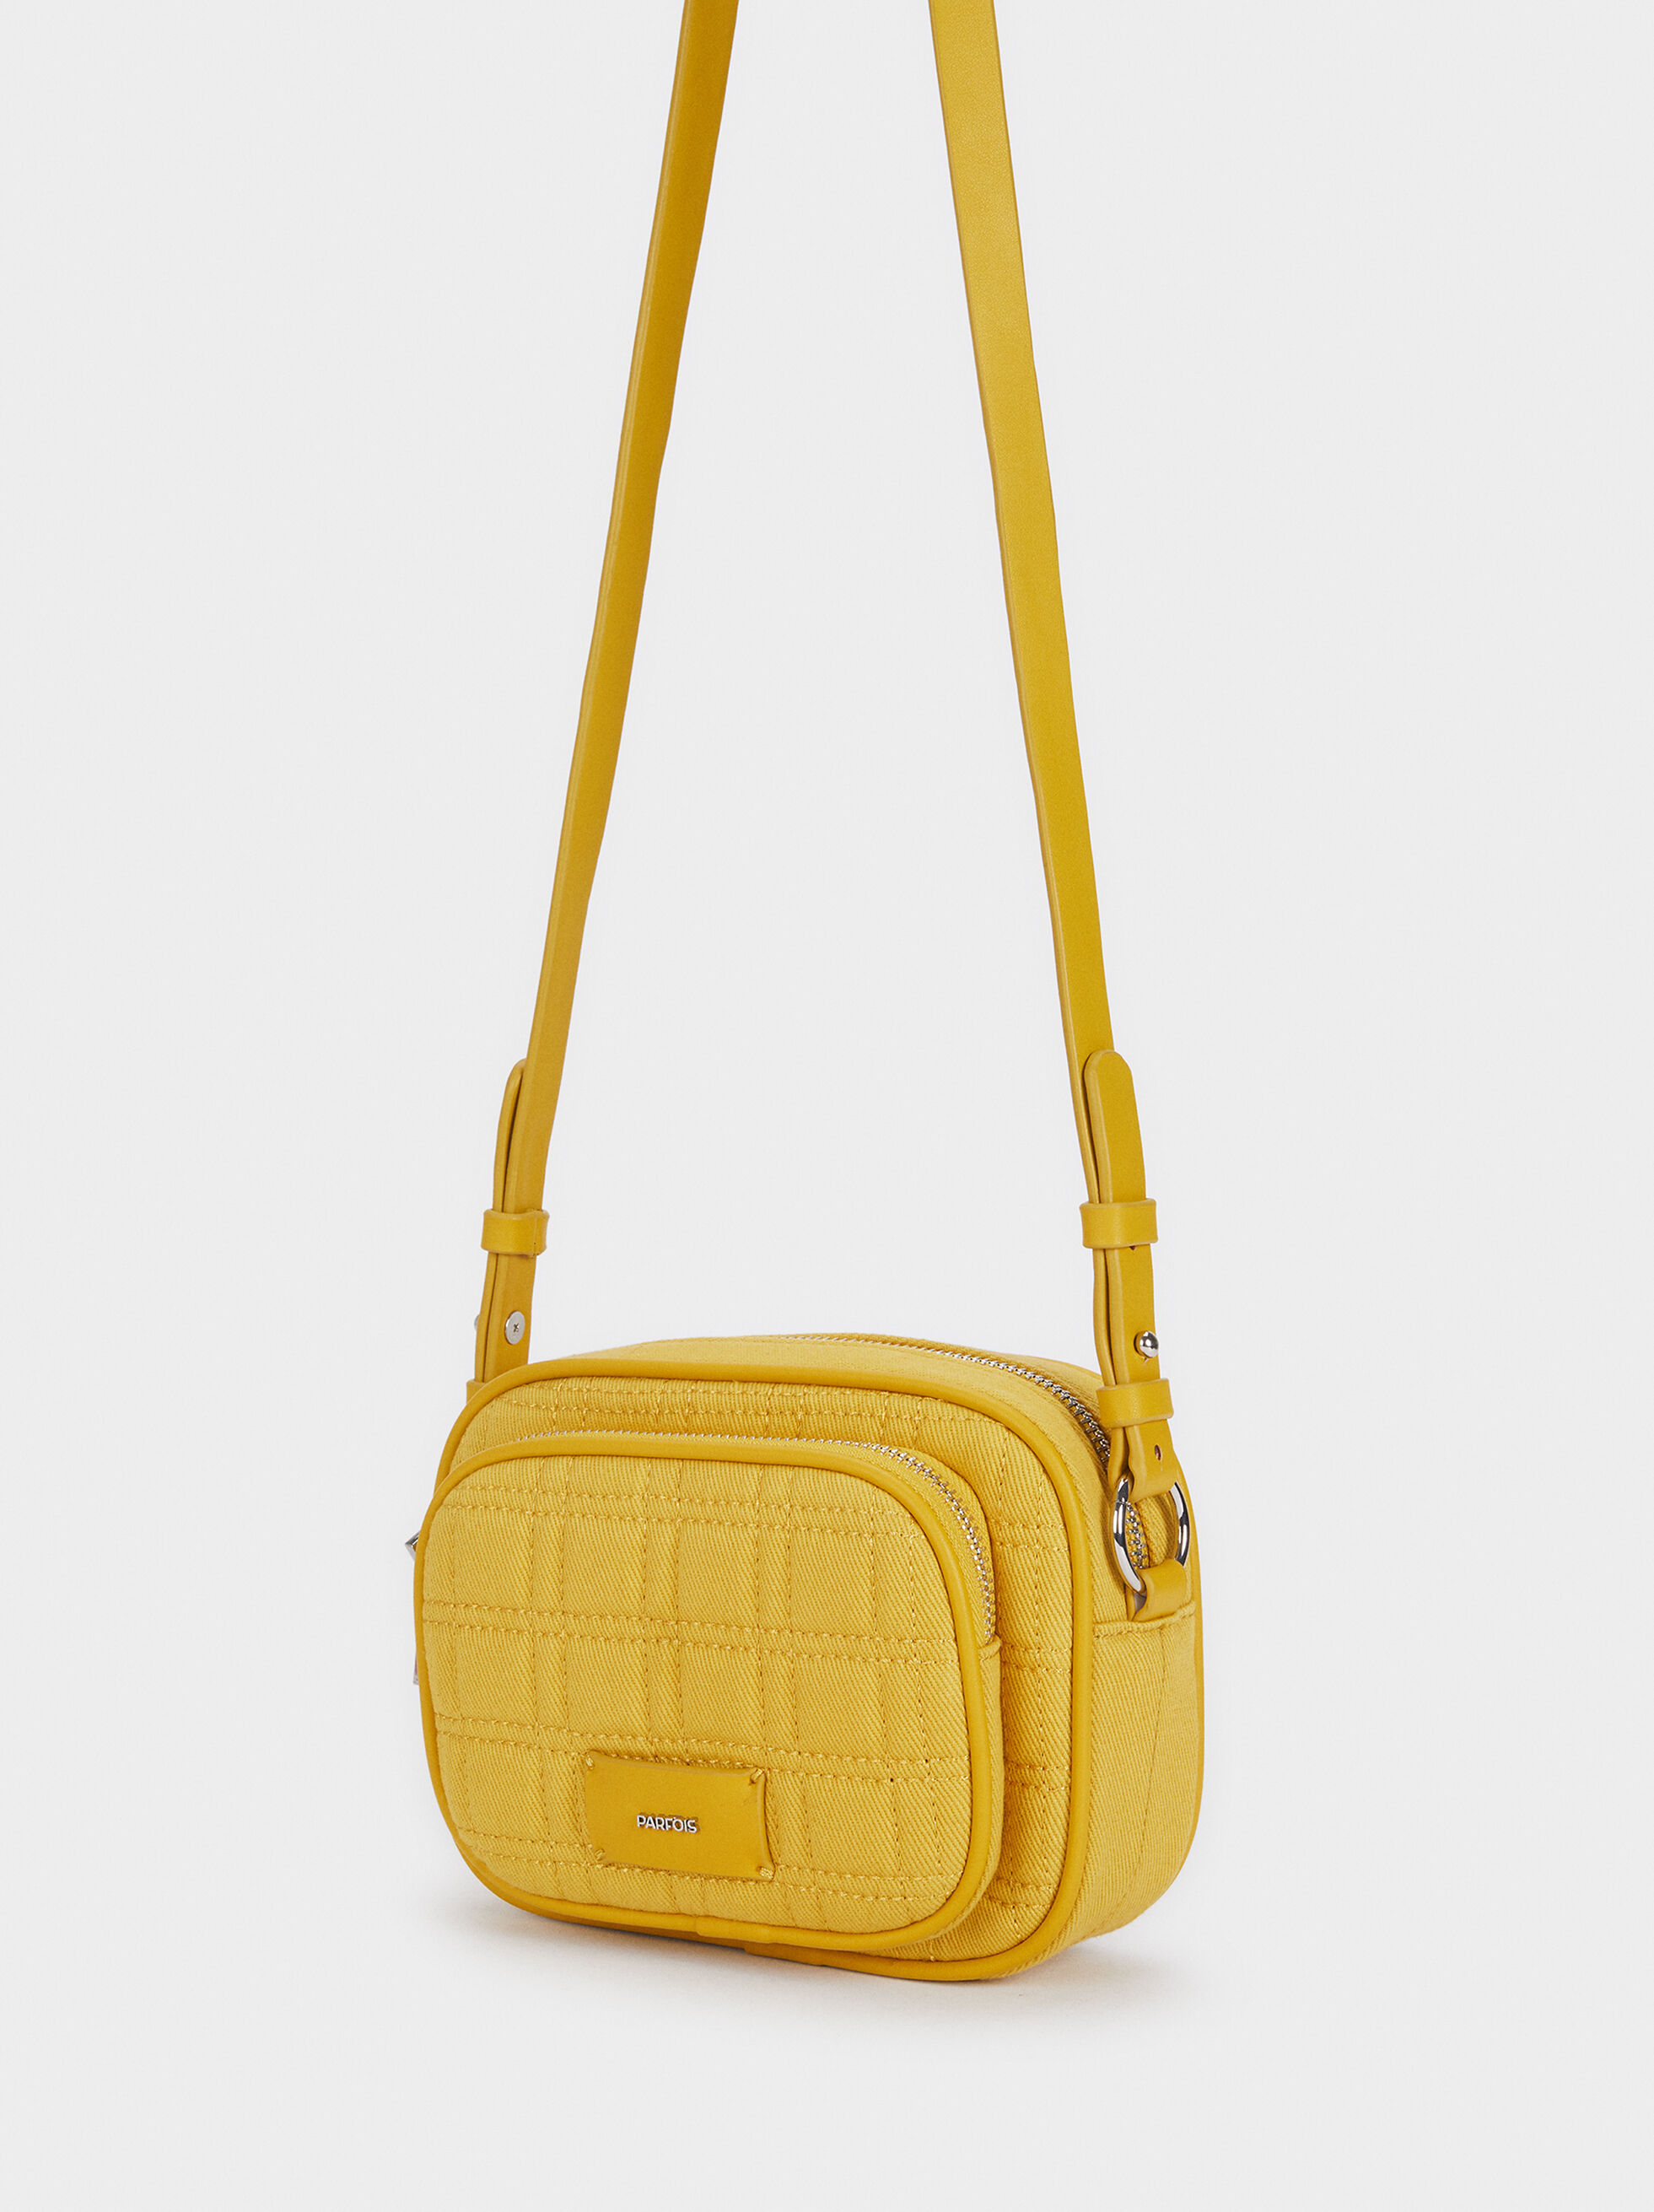 Crossbody Bag With Adjustable Strap, Yellow, hi-res